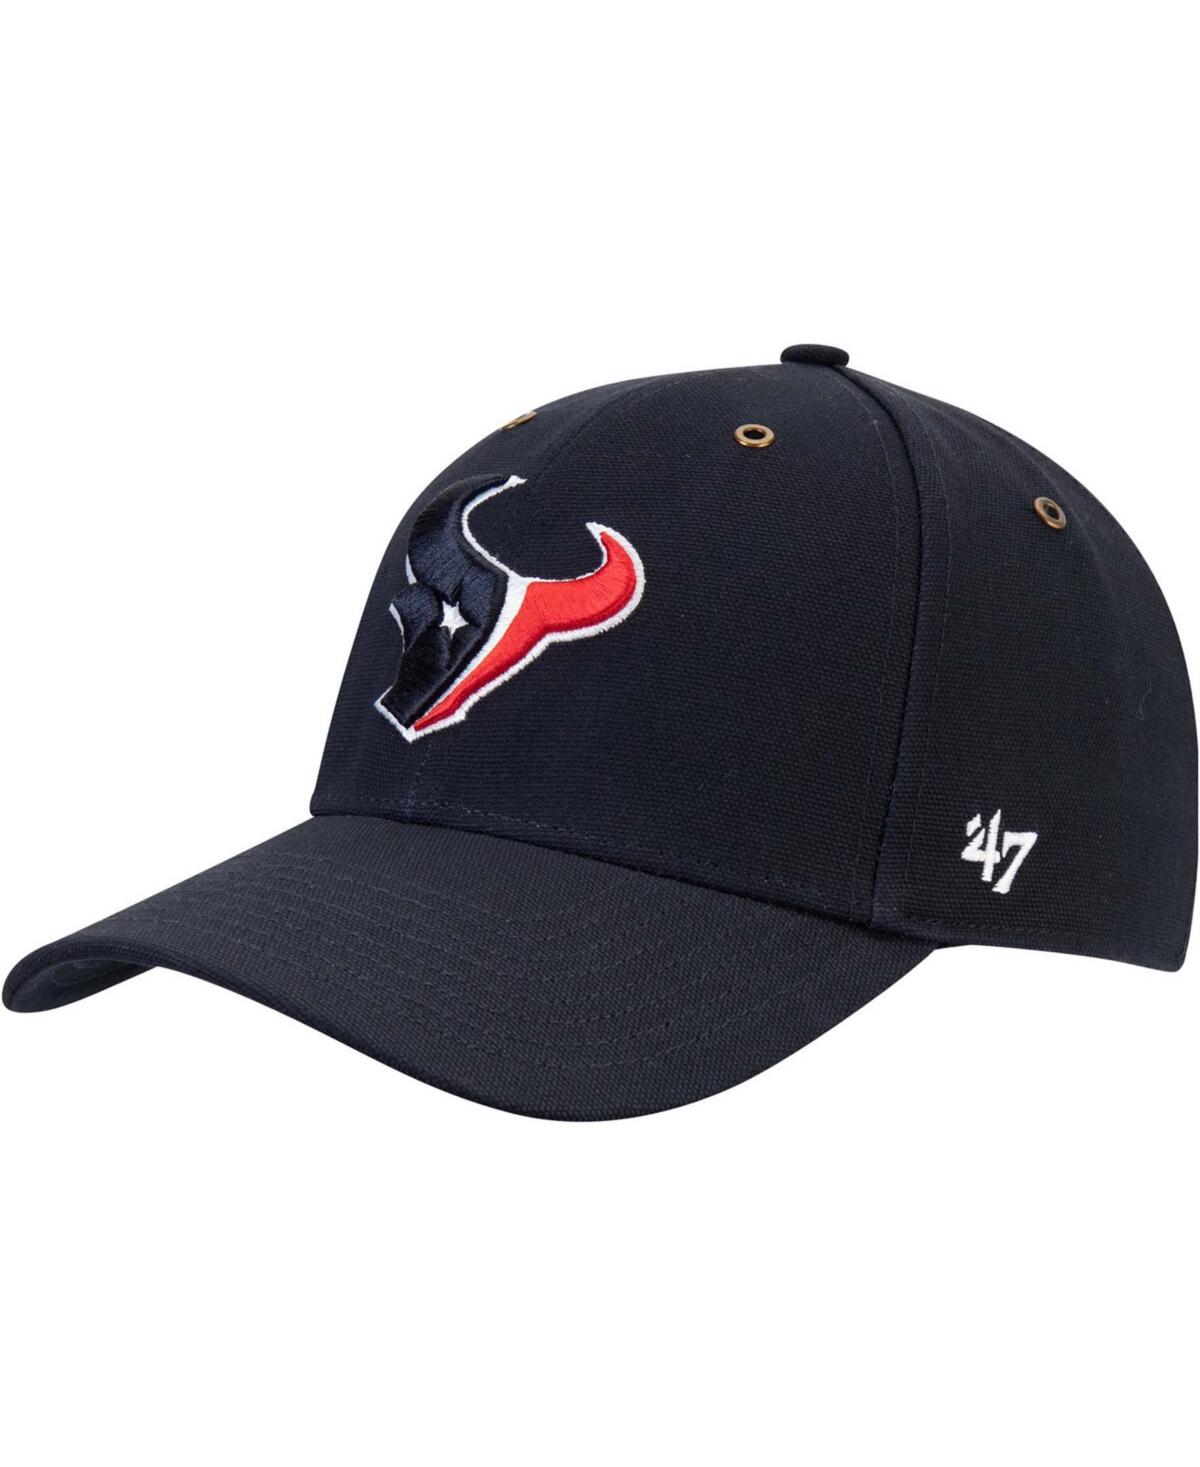 47 Brand Mens Carhartt Houston Texans Mvp Team Adjustable Cap